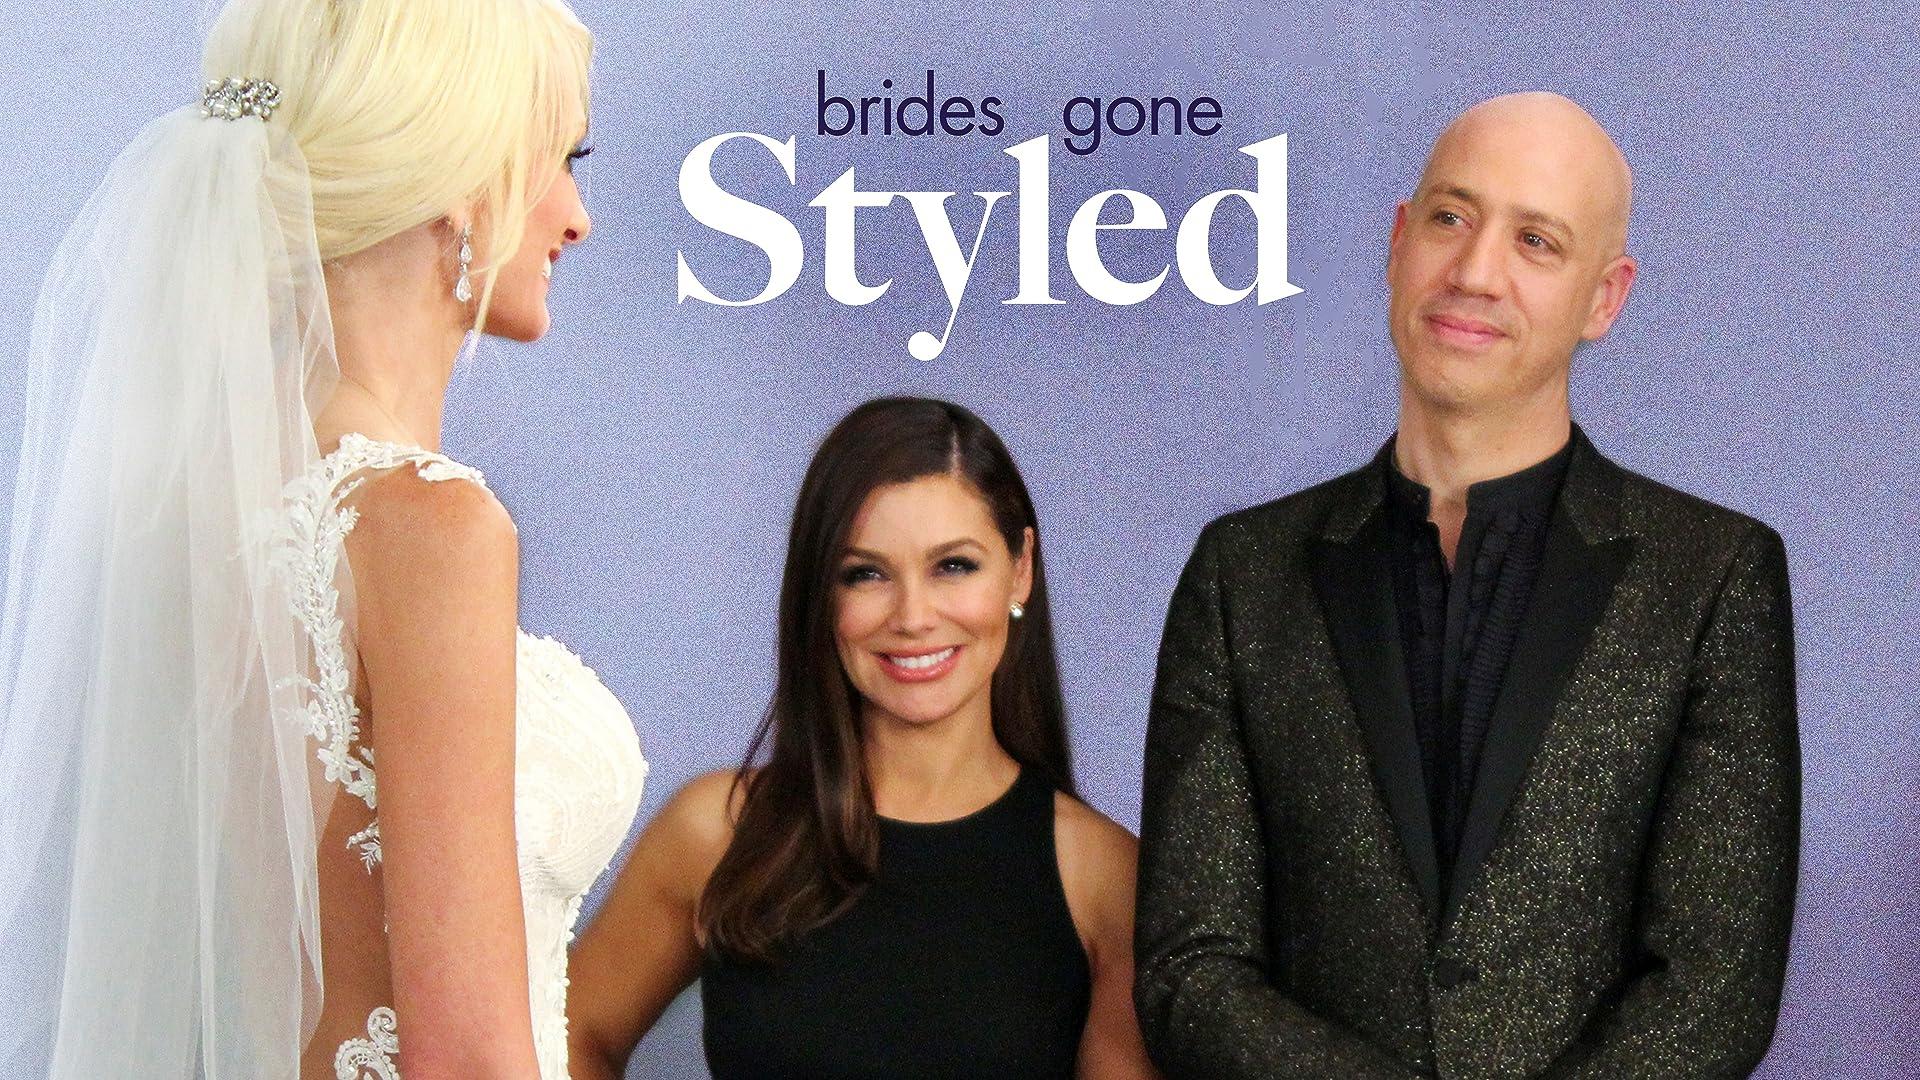 Brides Gone Styled - Season 1